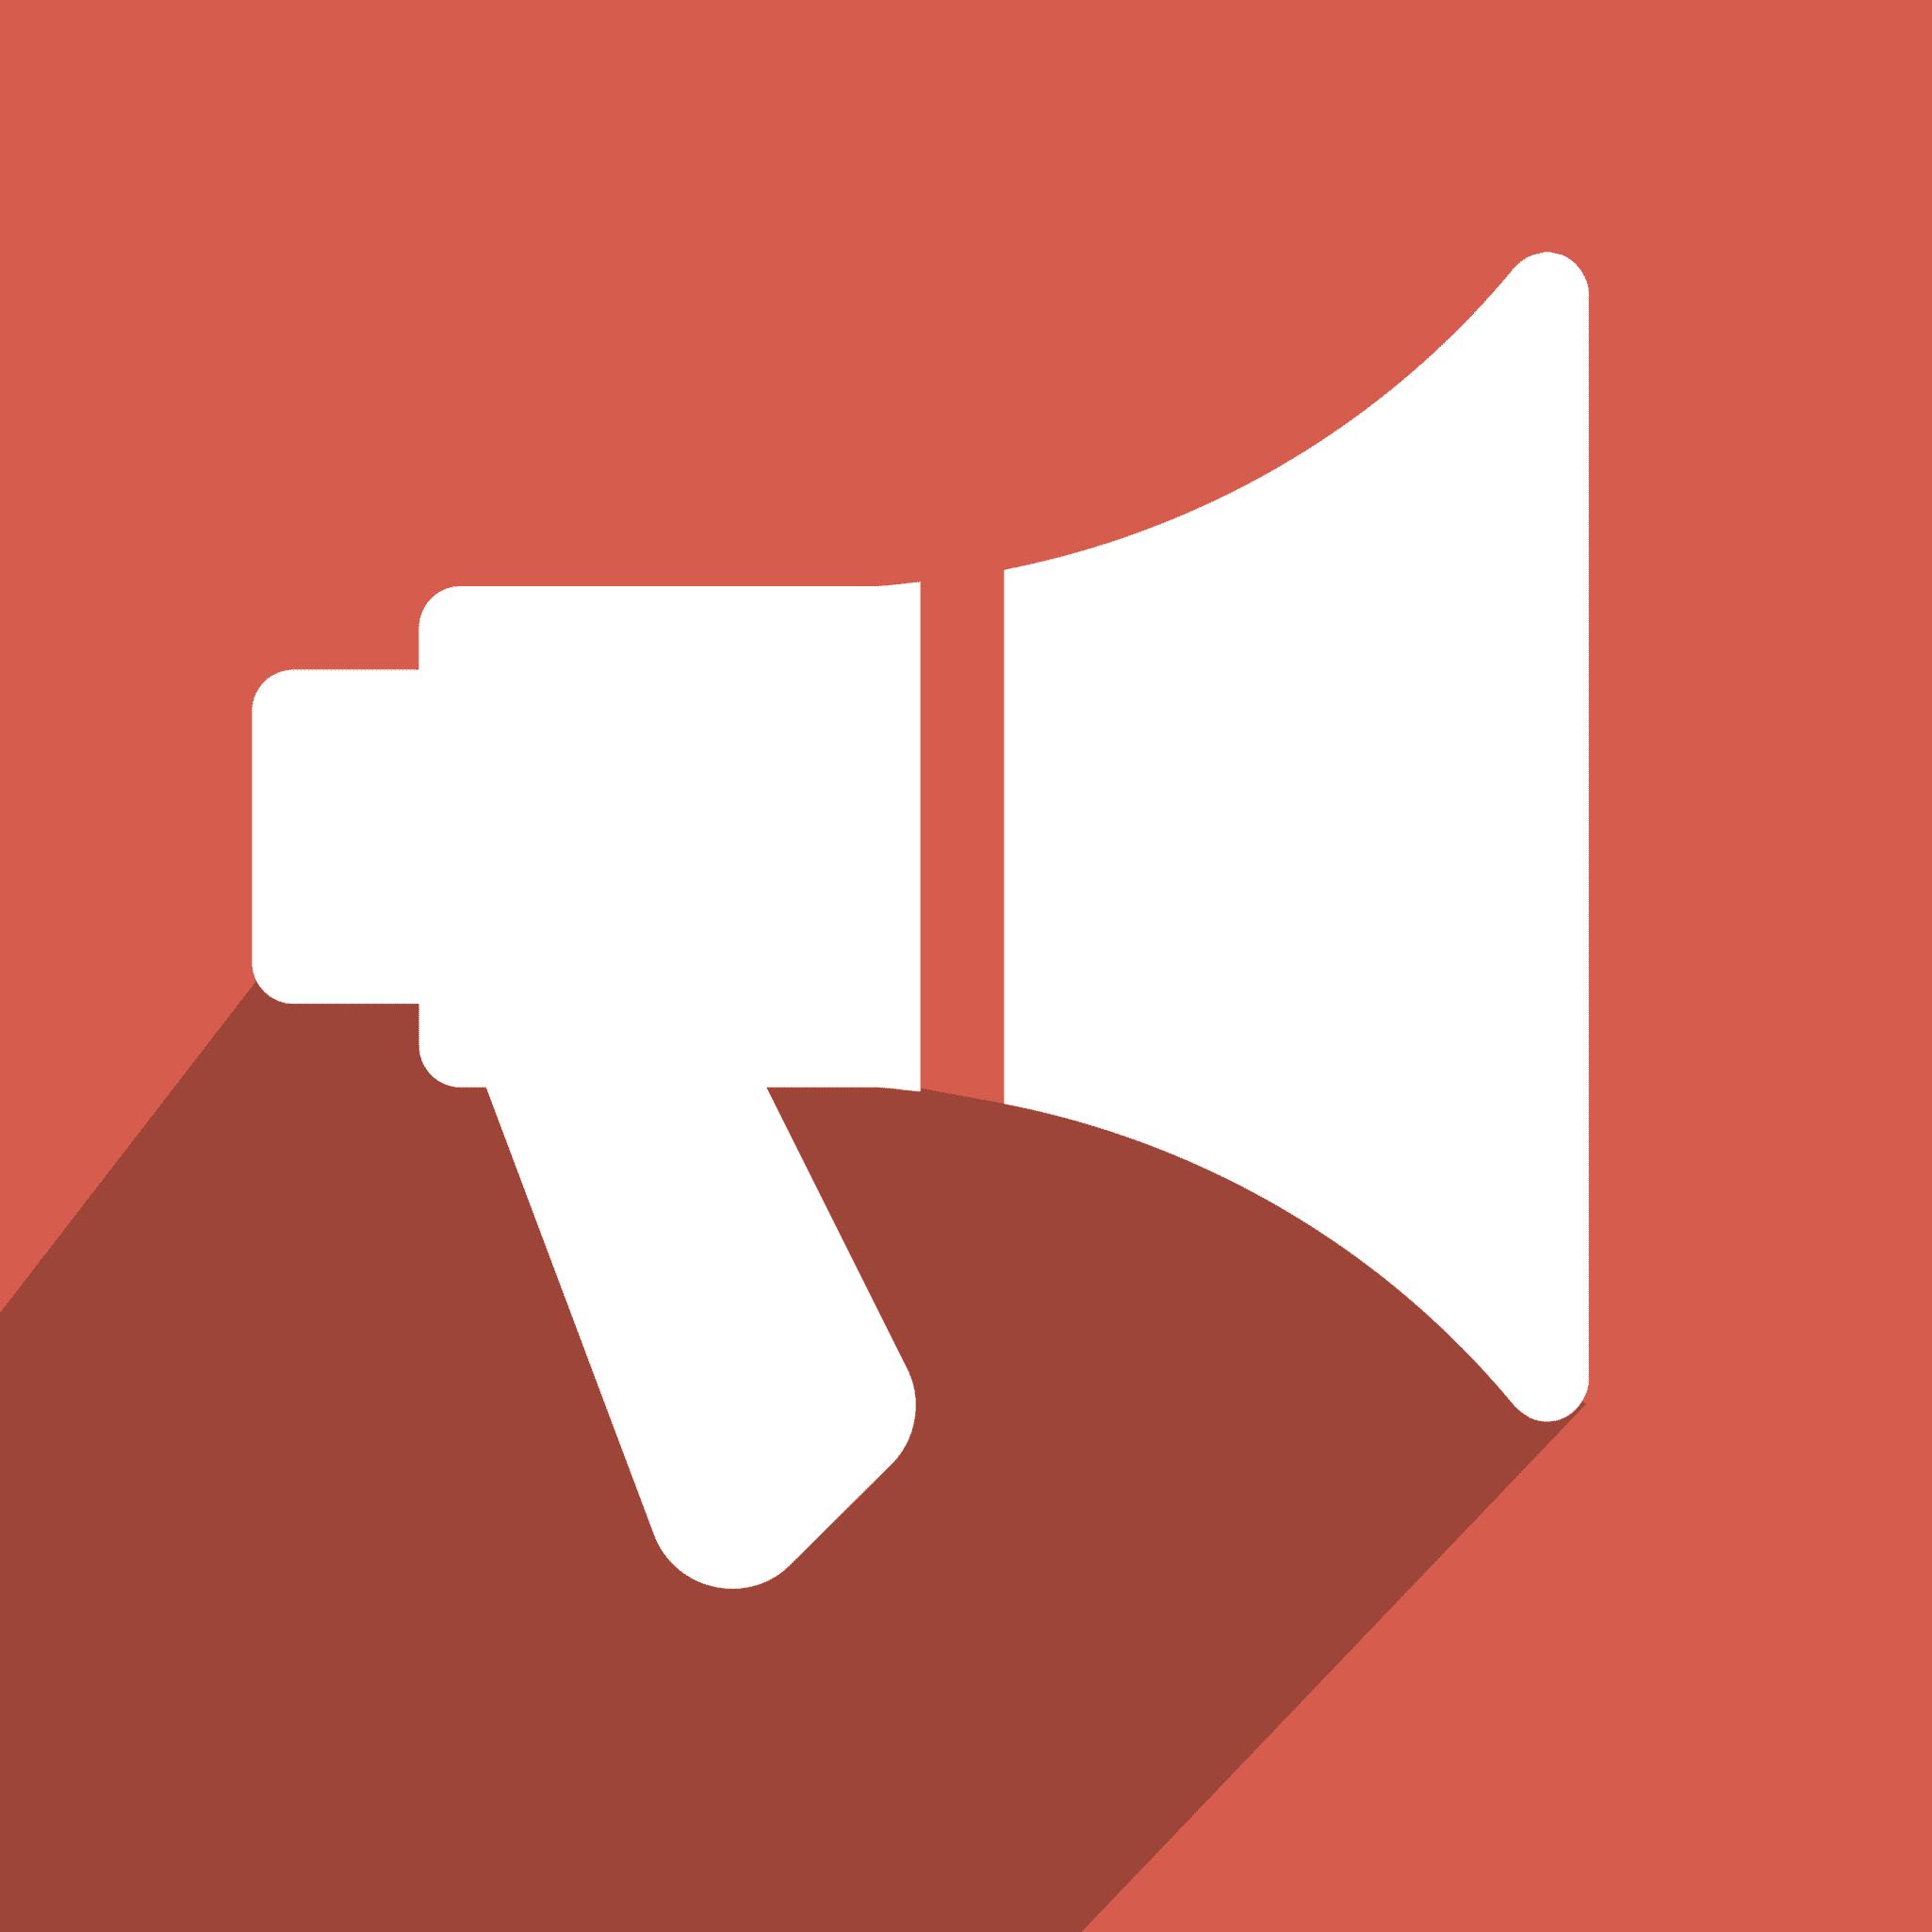 Whistleblower Protection Procedure